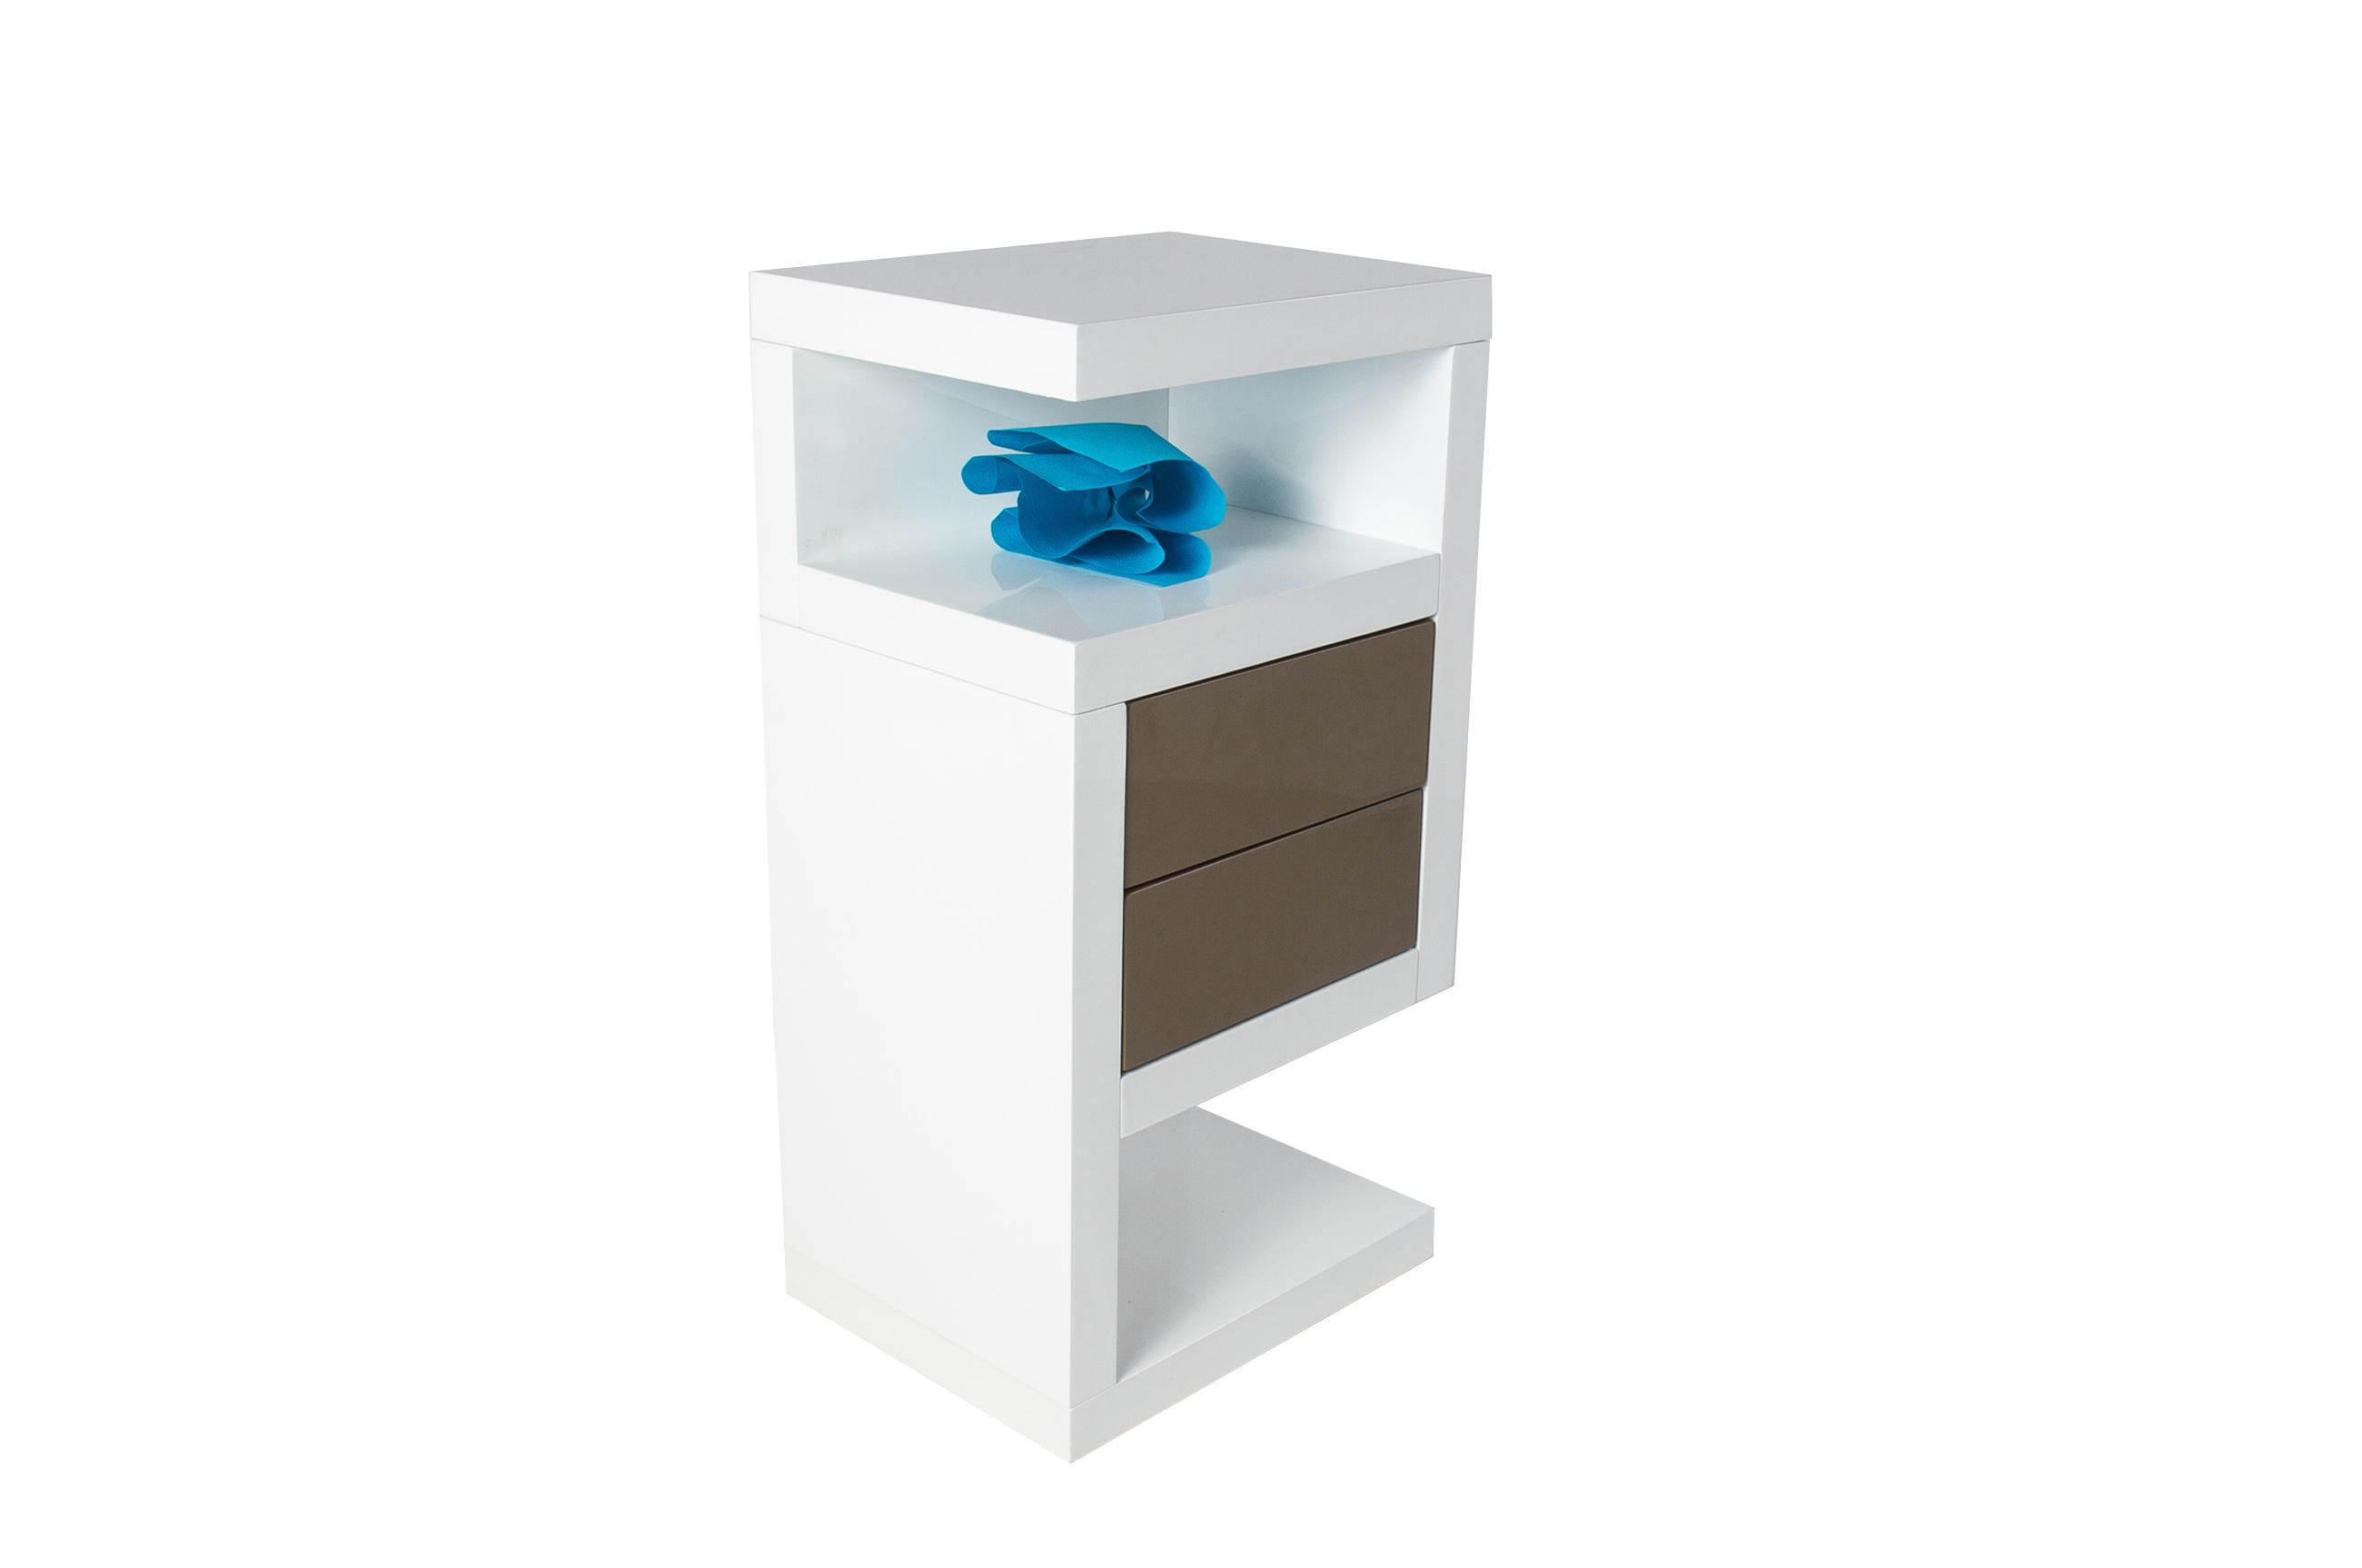 sam nachtkommode wei hochglanz rechts boxspring nako neomi. Black Bedroom Furniture Sets. Home Design Ideas